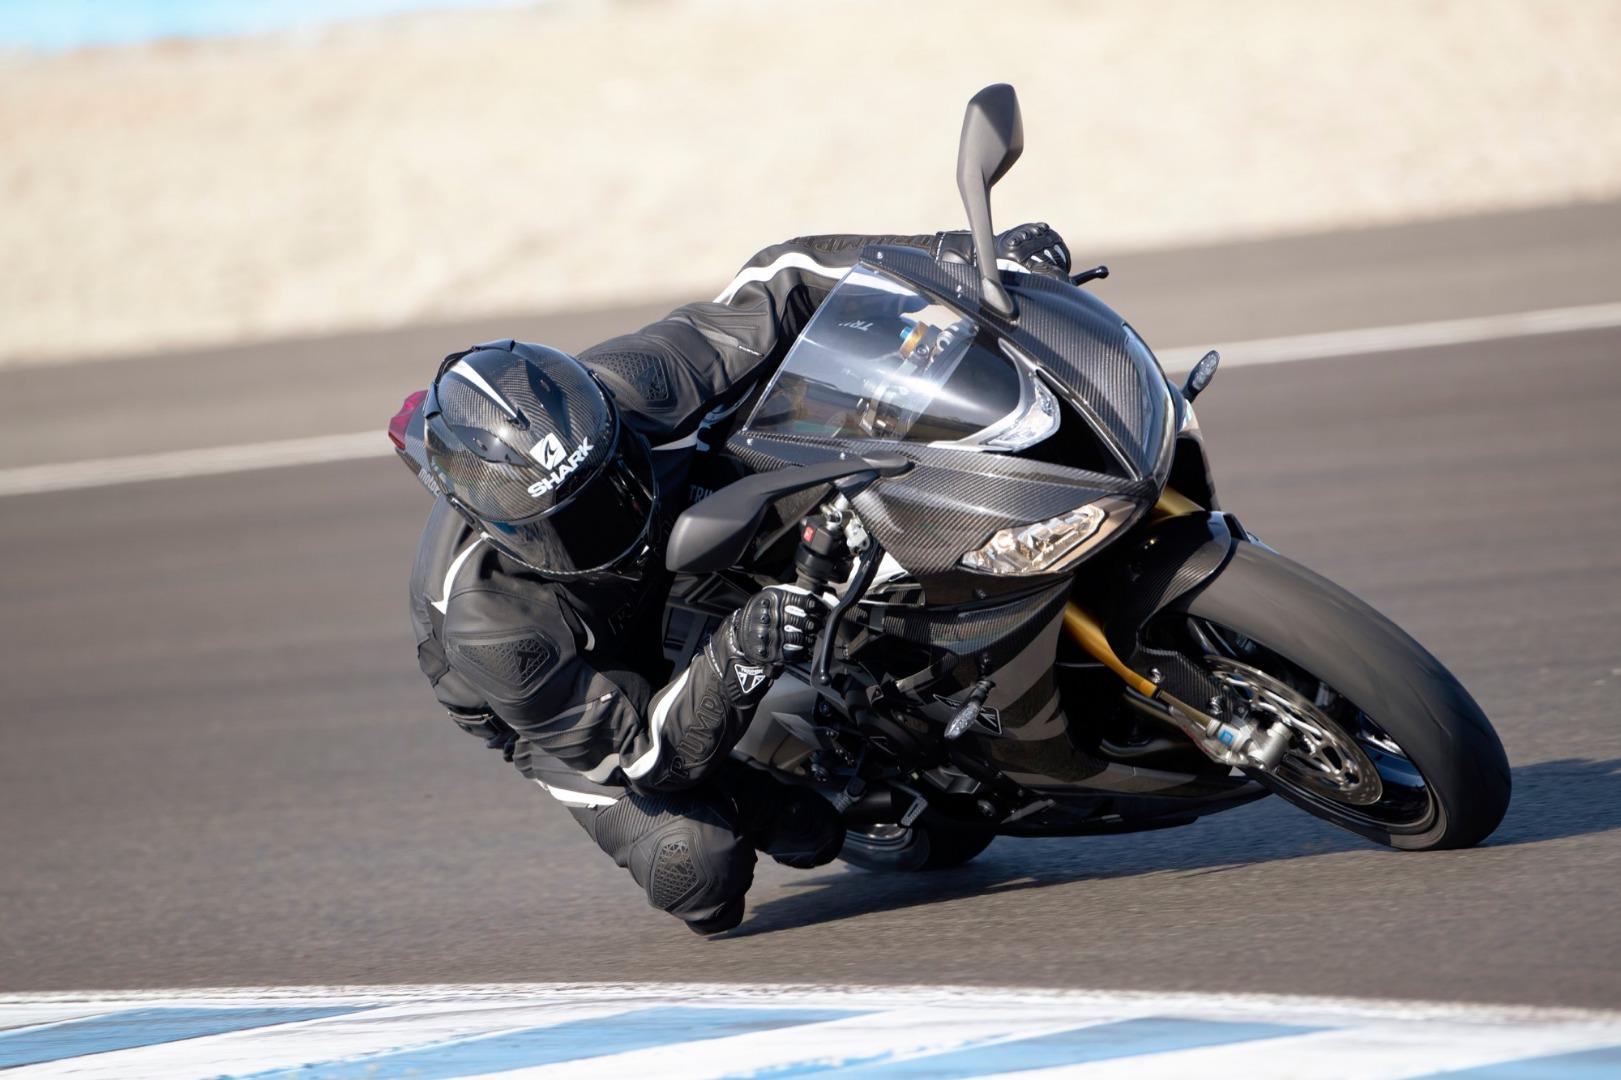 Triumph Daytona 765 Moto2 Limited Edition